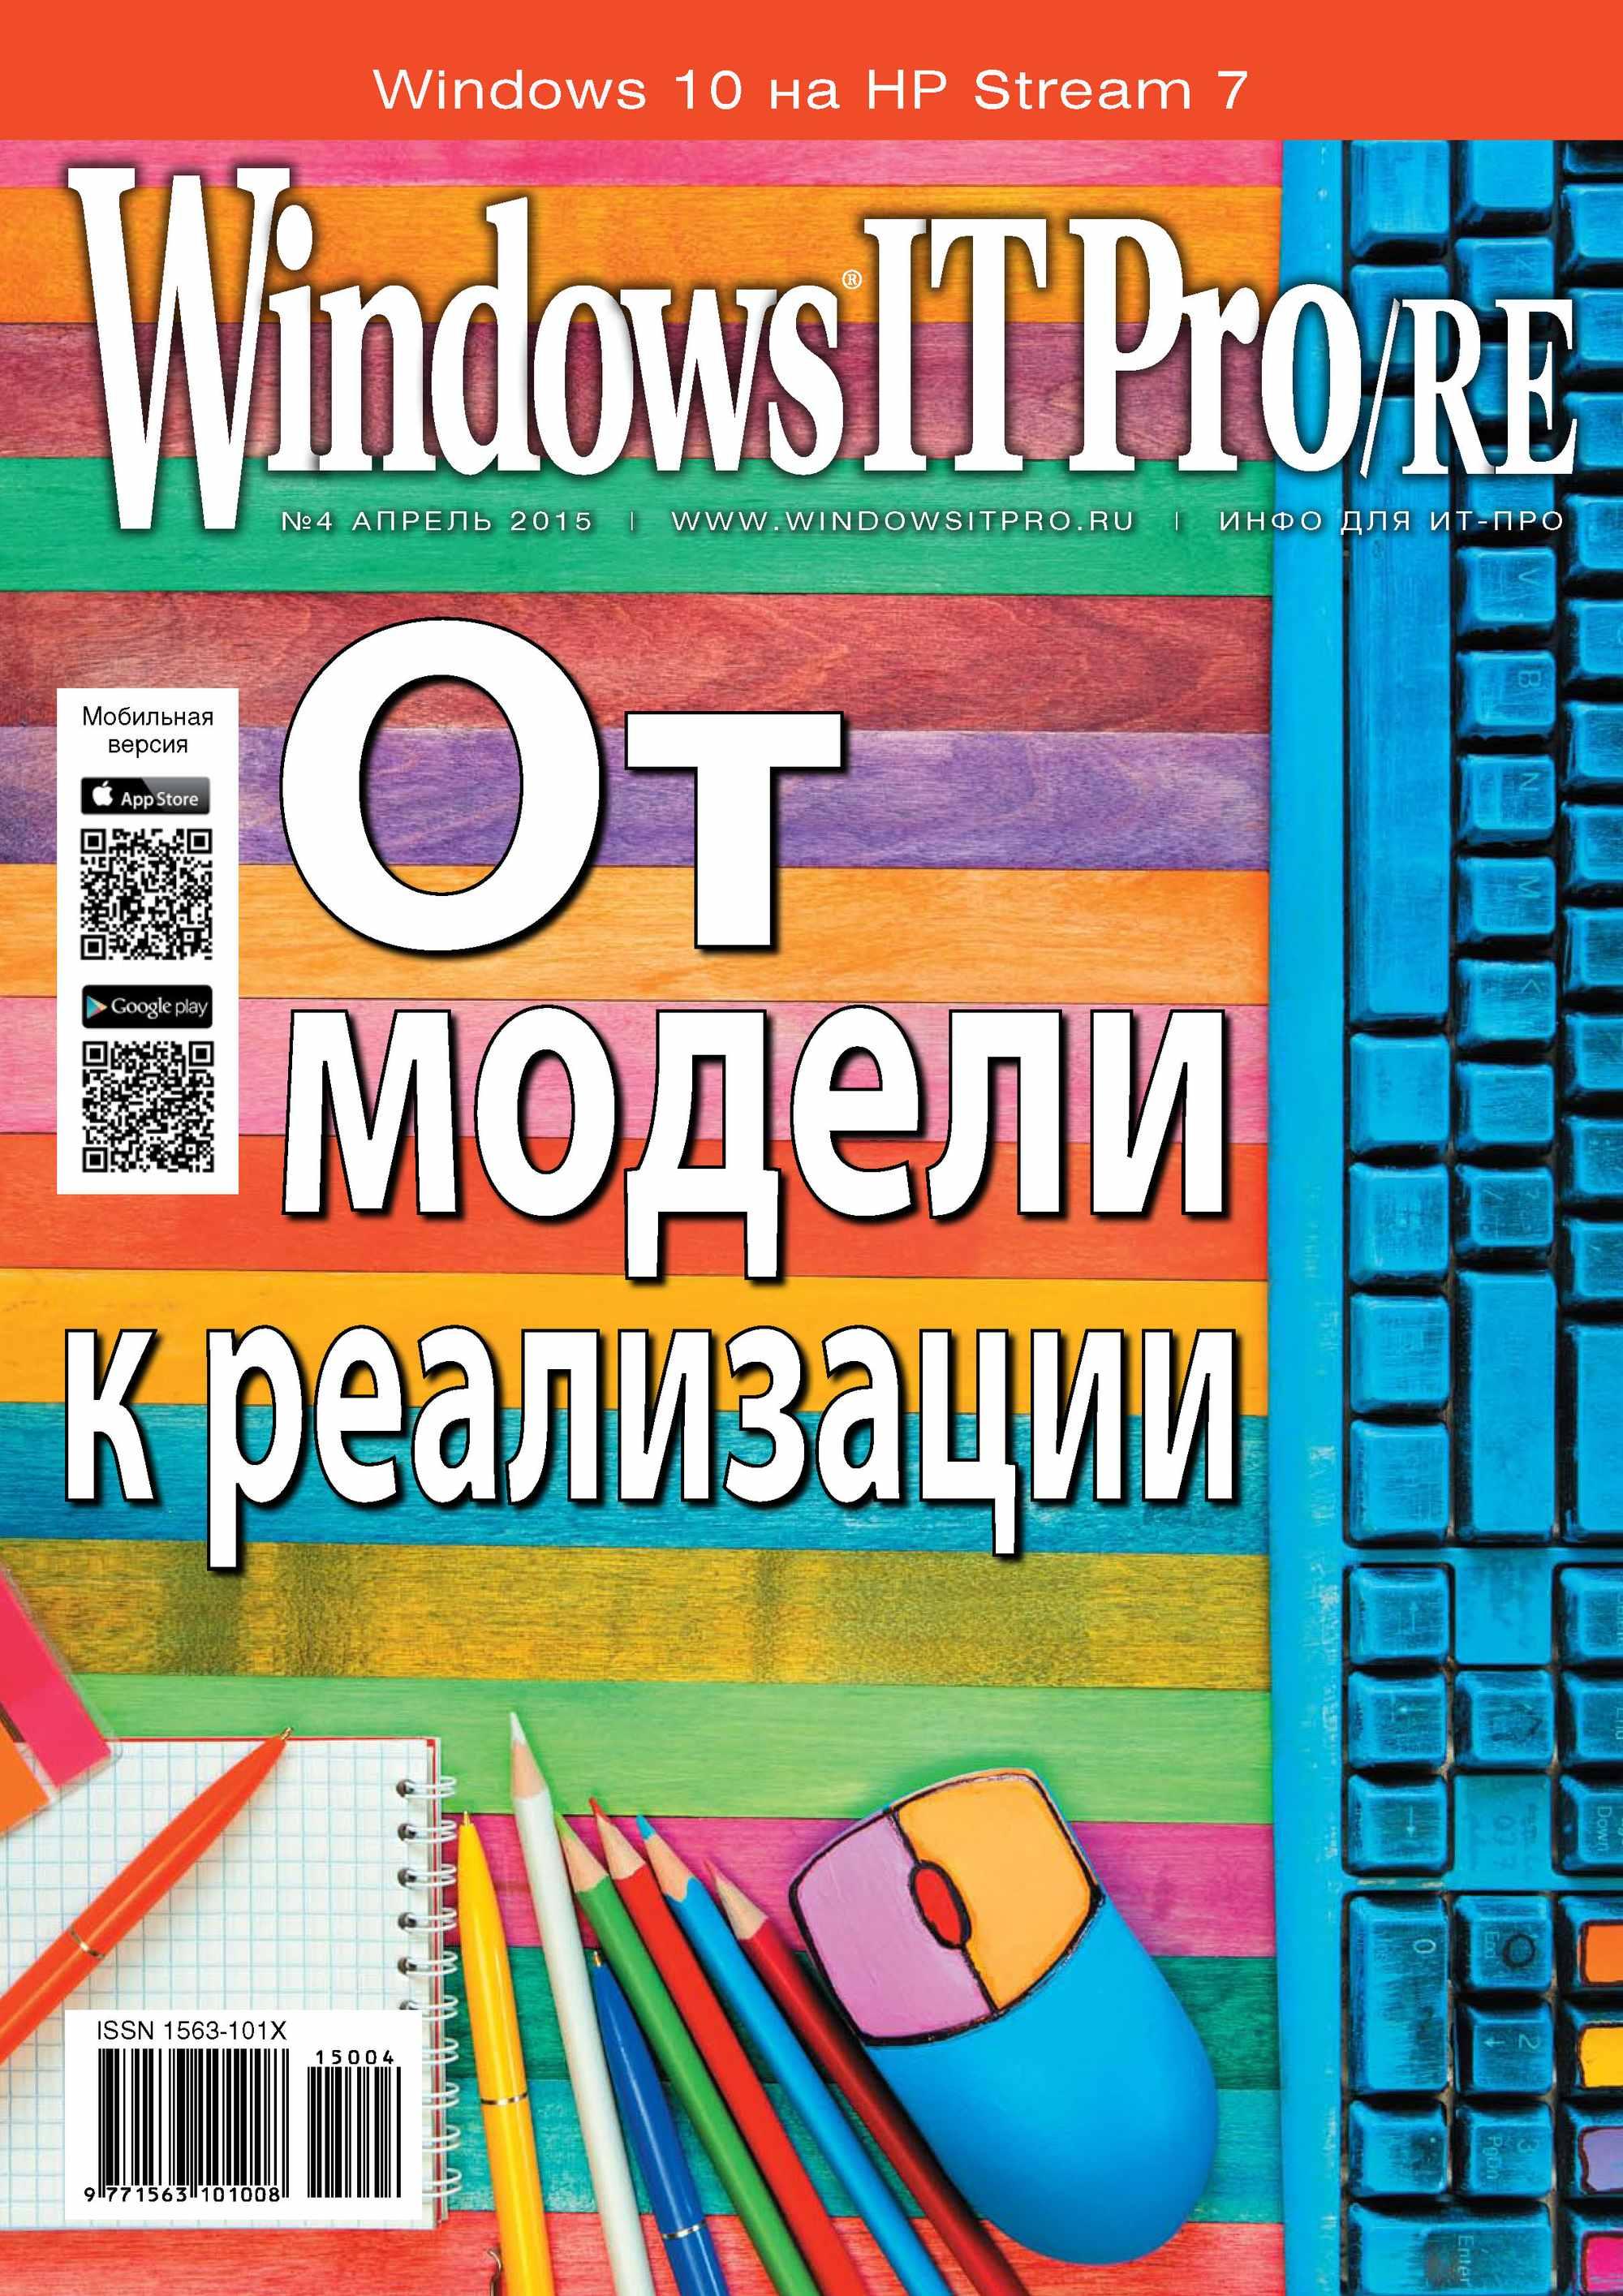 Открытые системы Windows IT Pro/RE №04/2015 открытые системы windows it pro re 01 2014